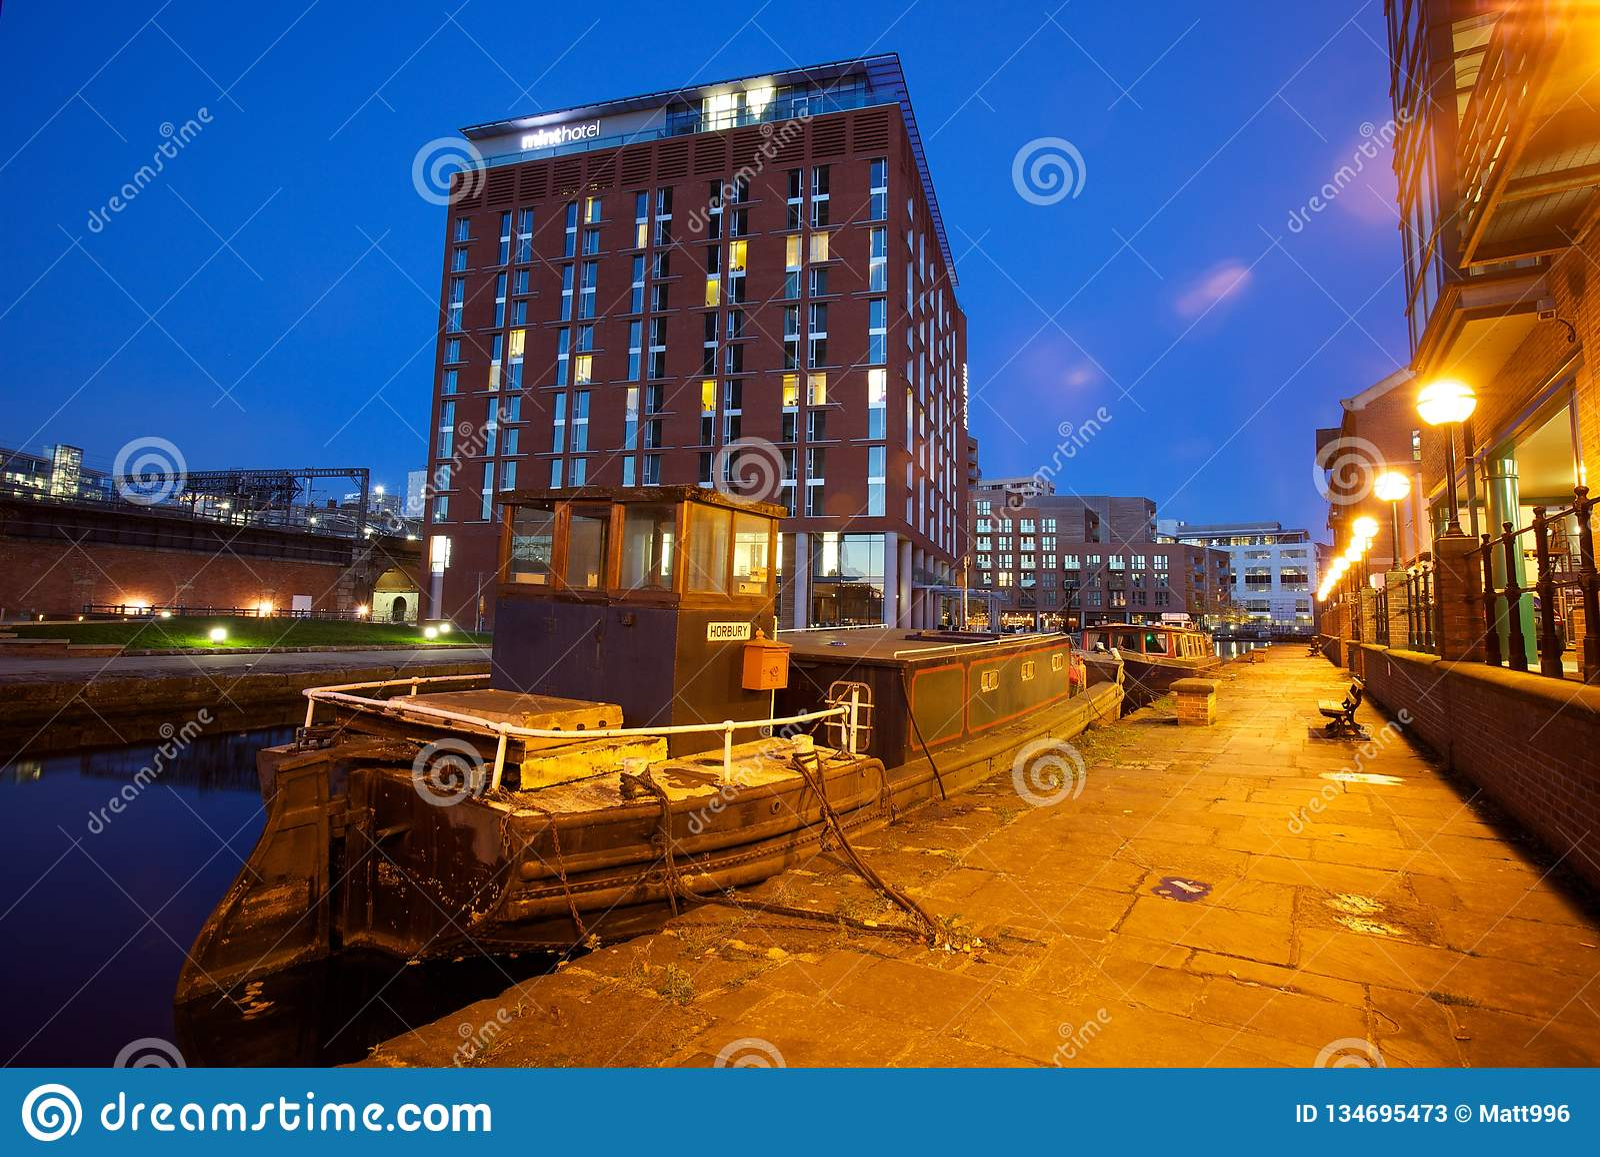 Modern northern European city at night